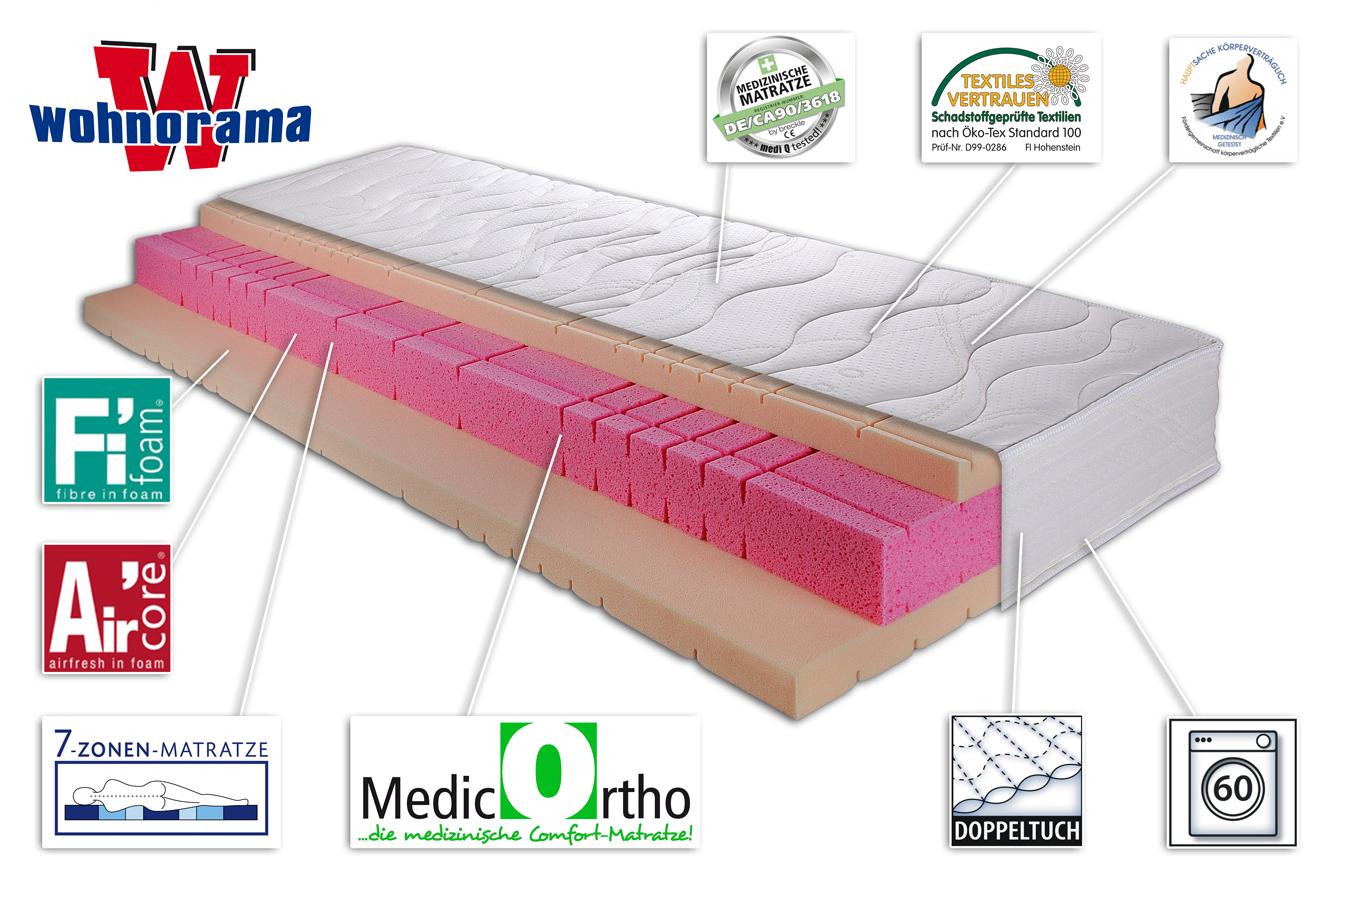 breckle matratzen 80x200 orthop dische medizinische matratze h2 medic ortho air fi. Black Bedroom Furniture Sets. Home Design Ideas